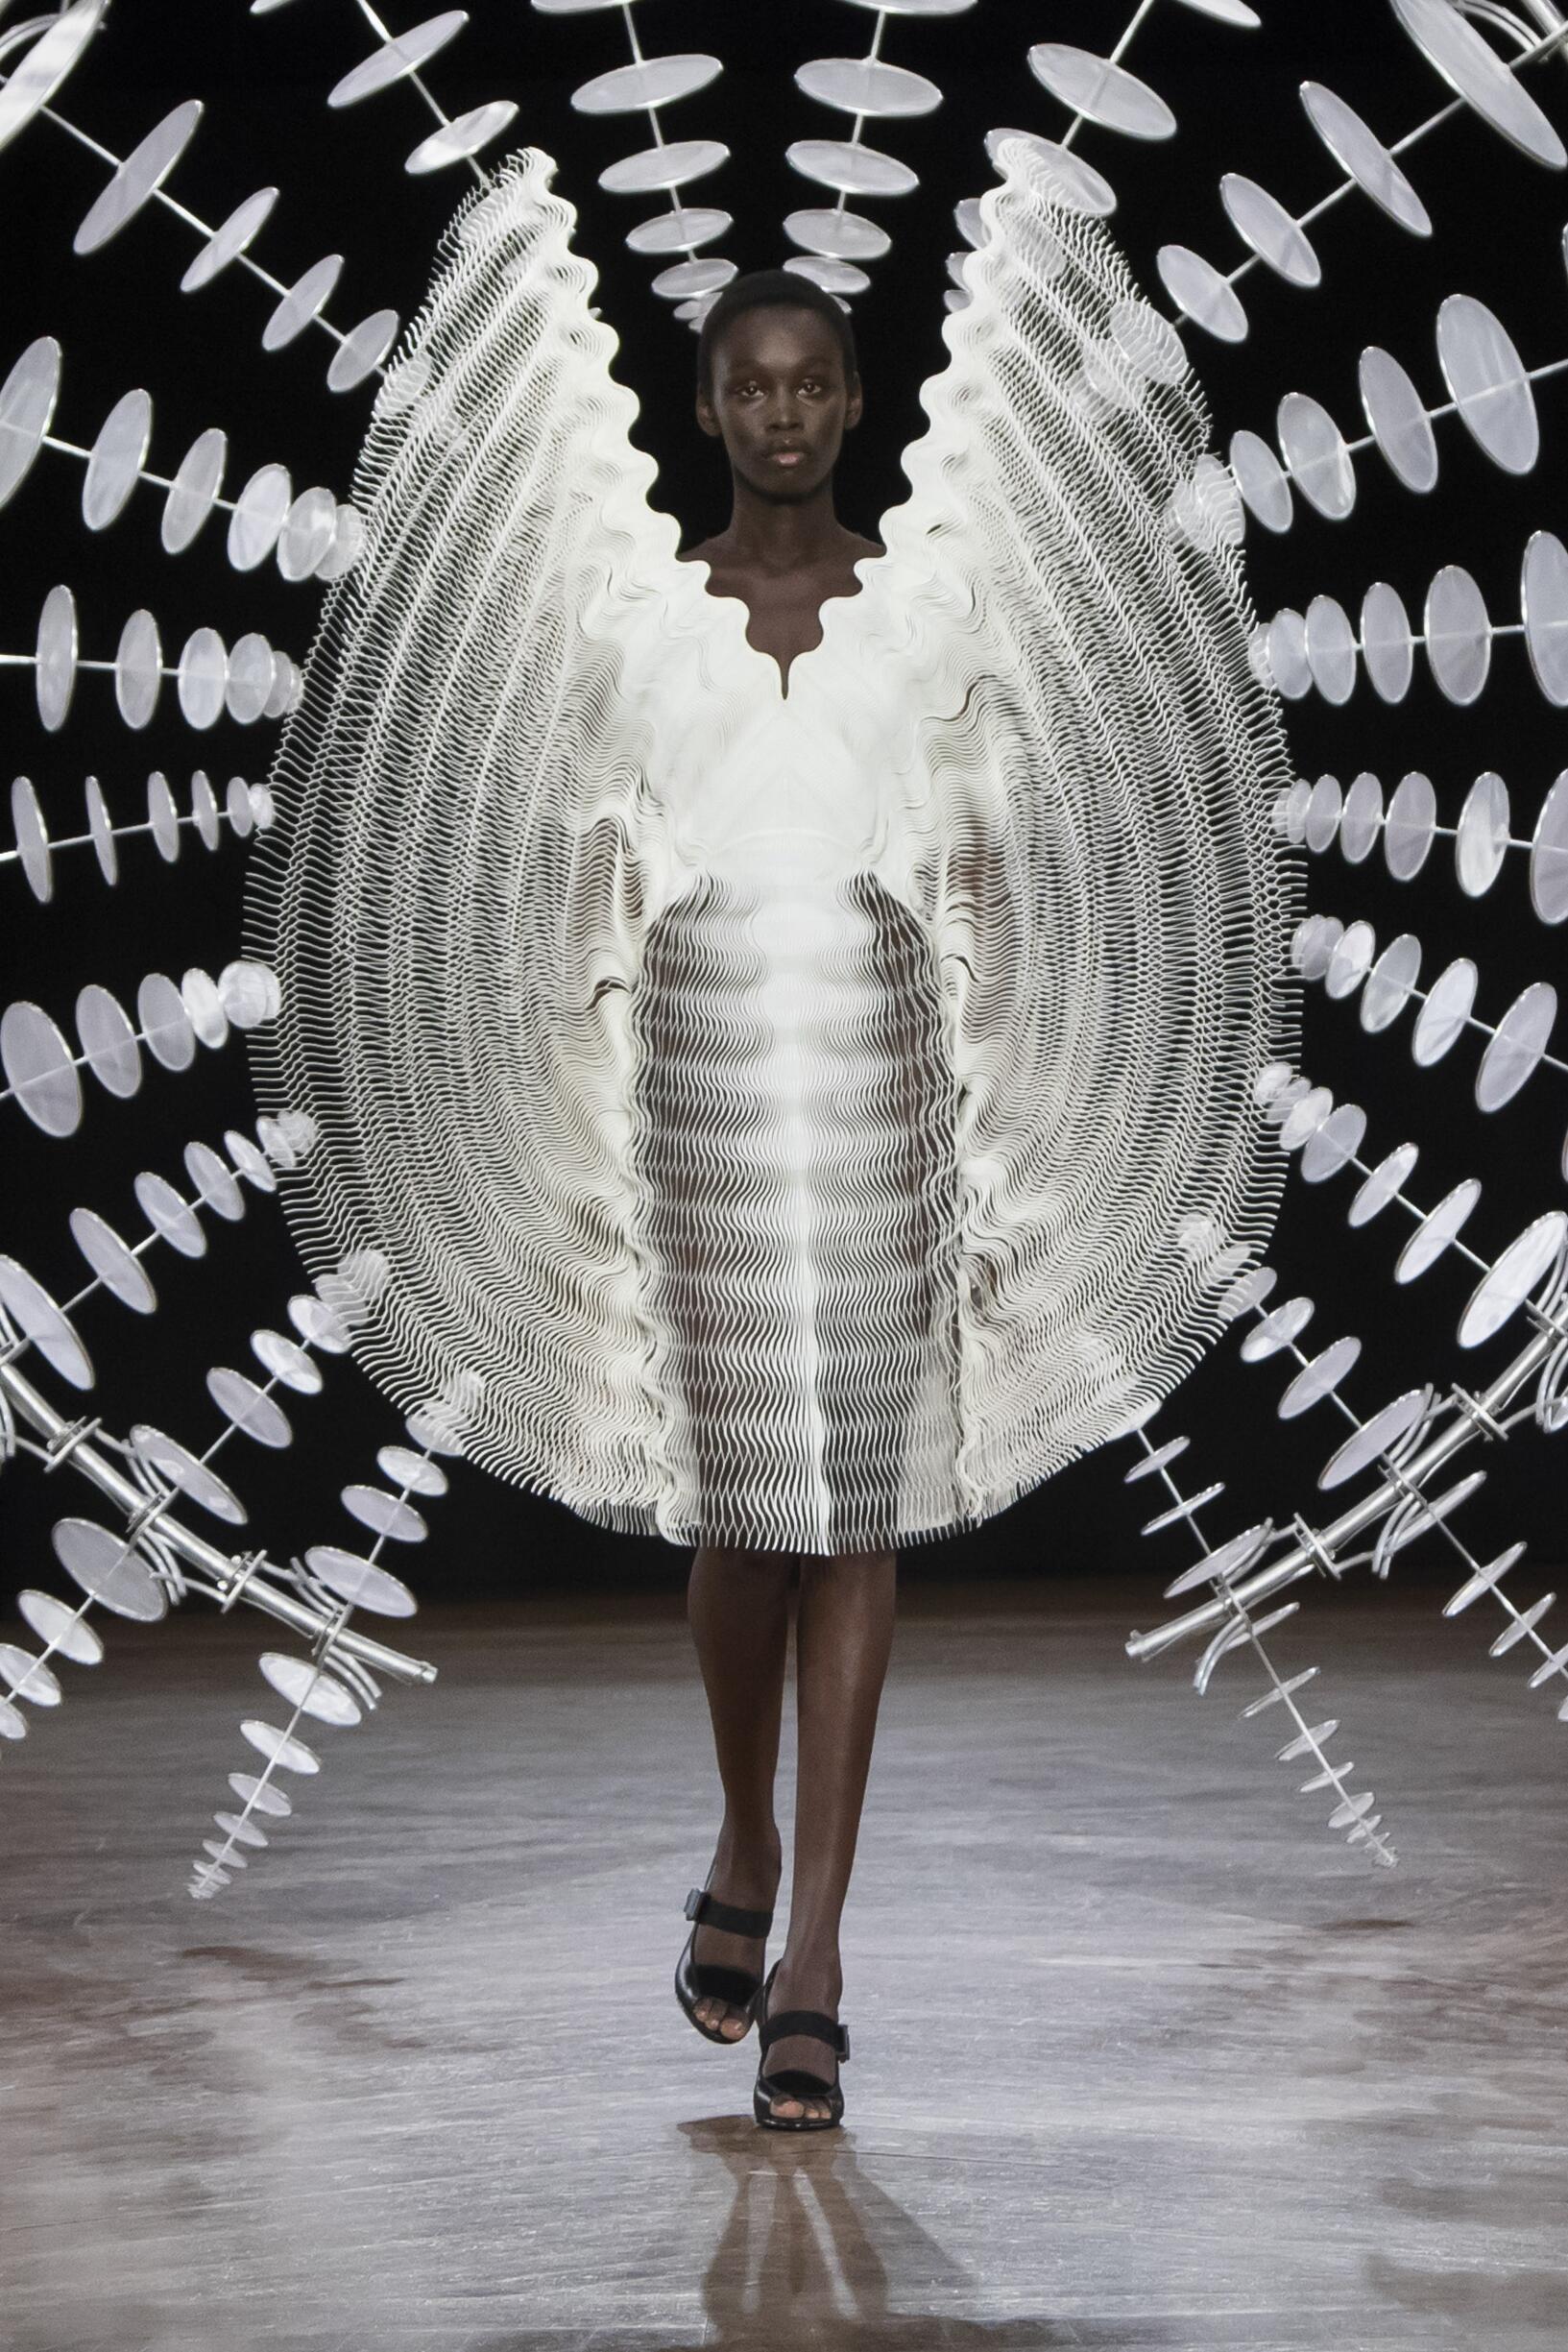 Fashion Show Woman Model Iris van Herpen Haute Couture Catwalk